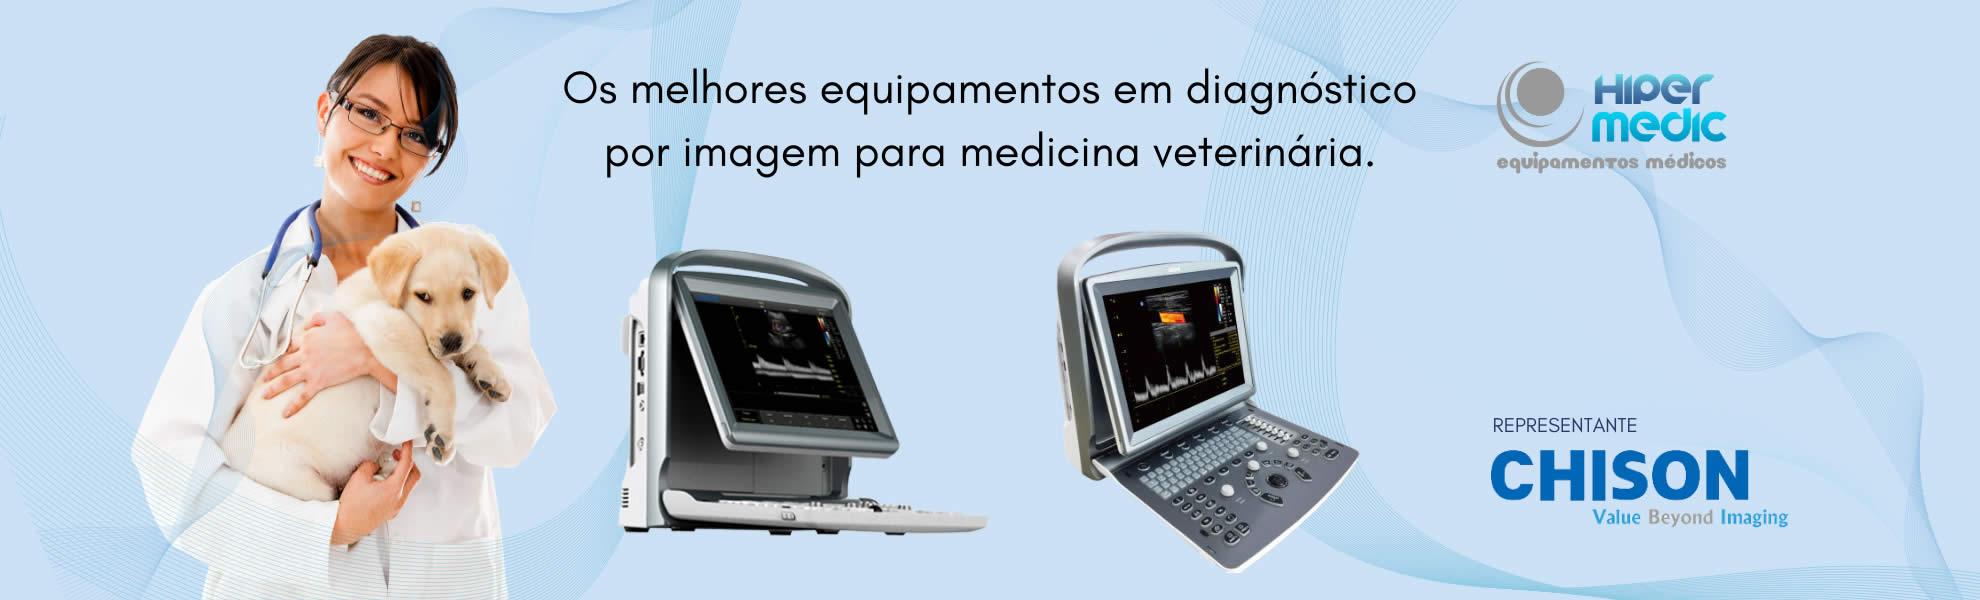 Hipermedic (3)